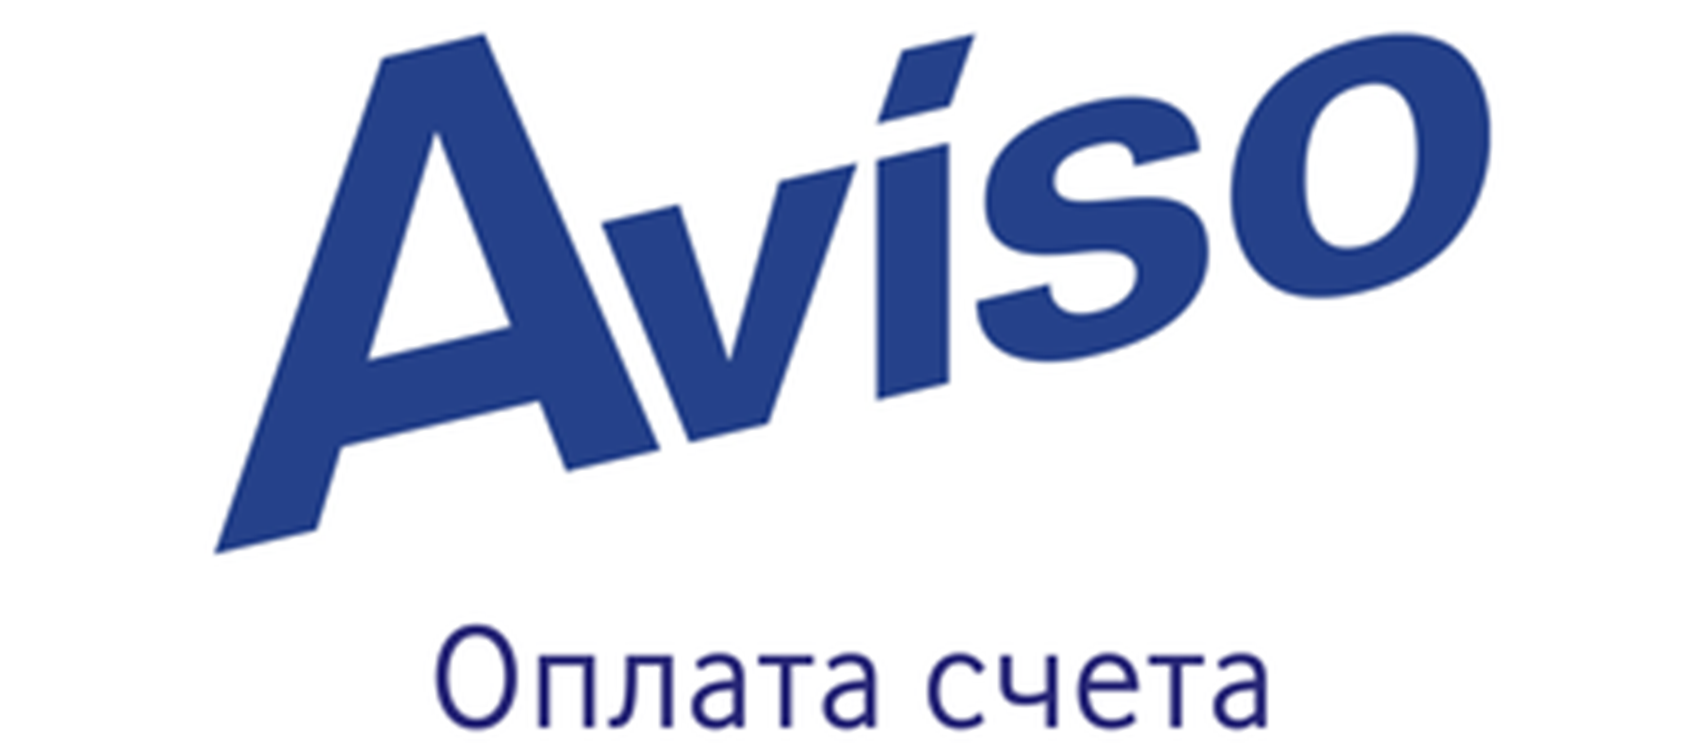 AVISO - Сплата рахунку